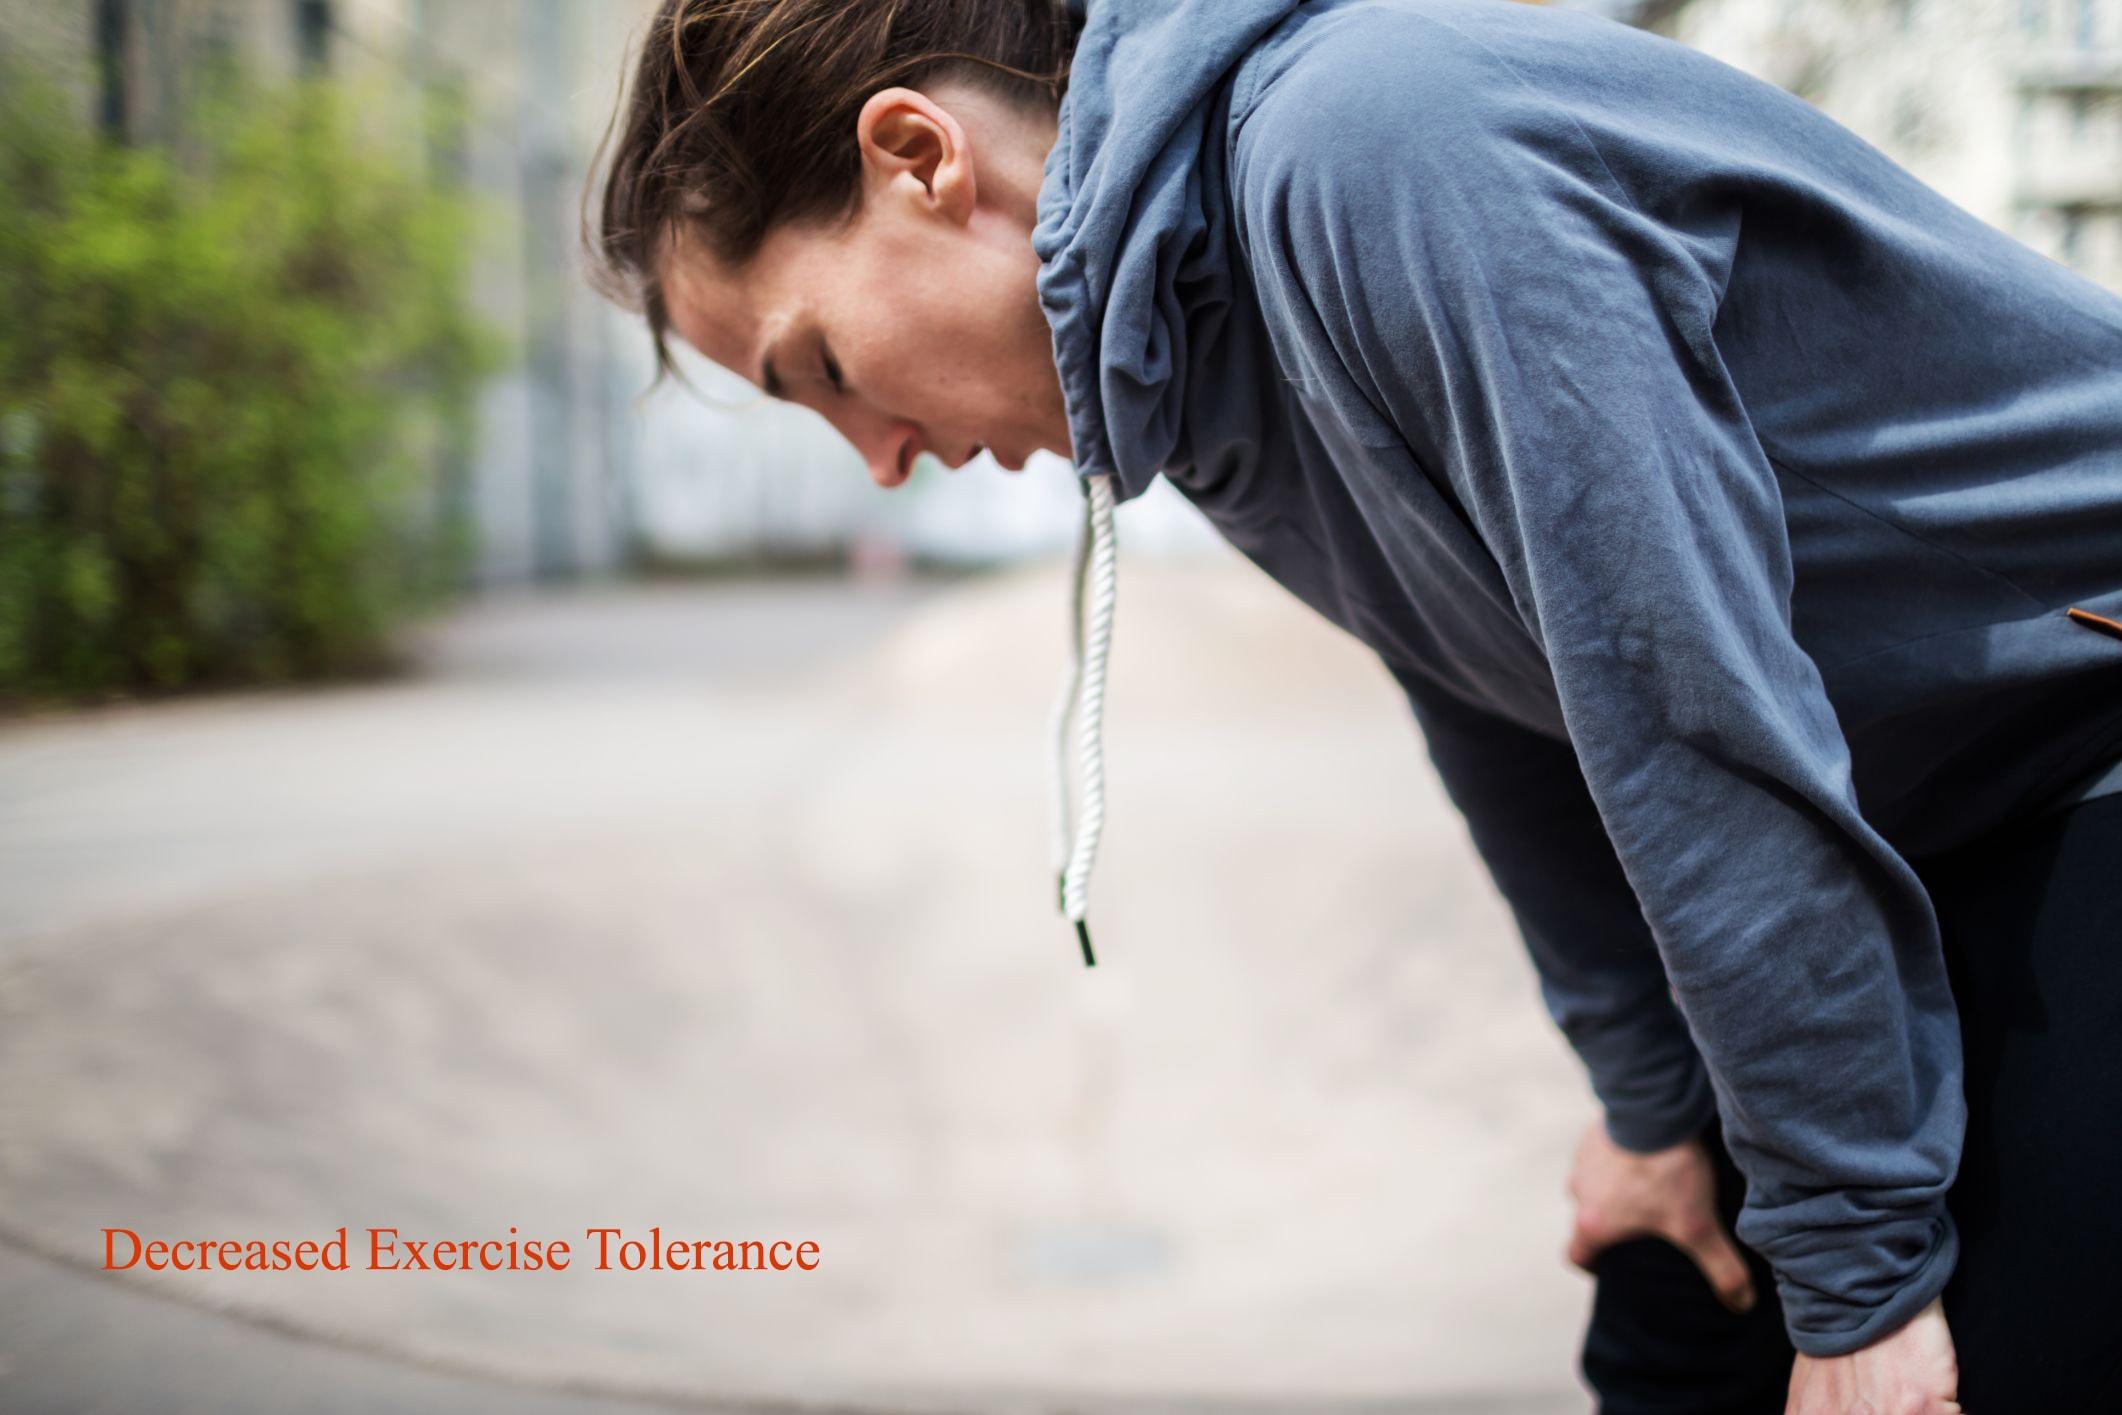 Decreased Exercise Tolerance